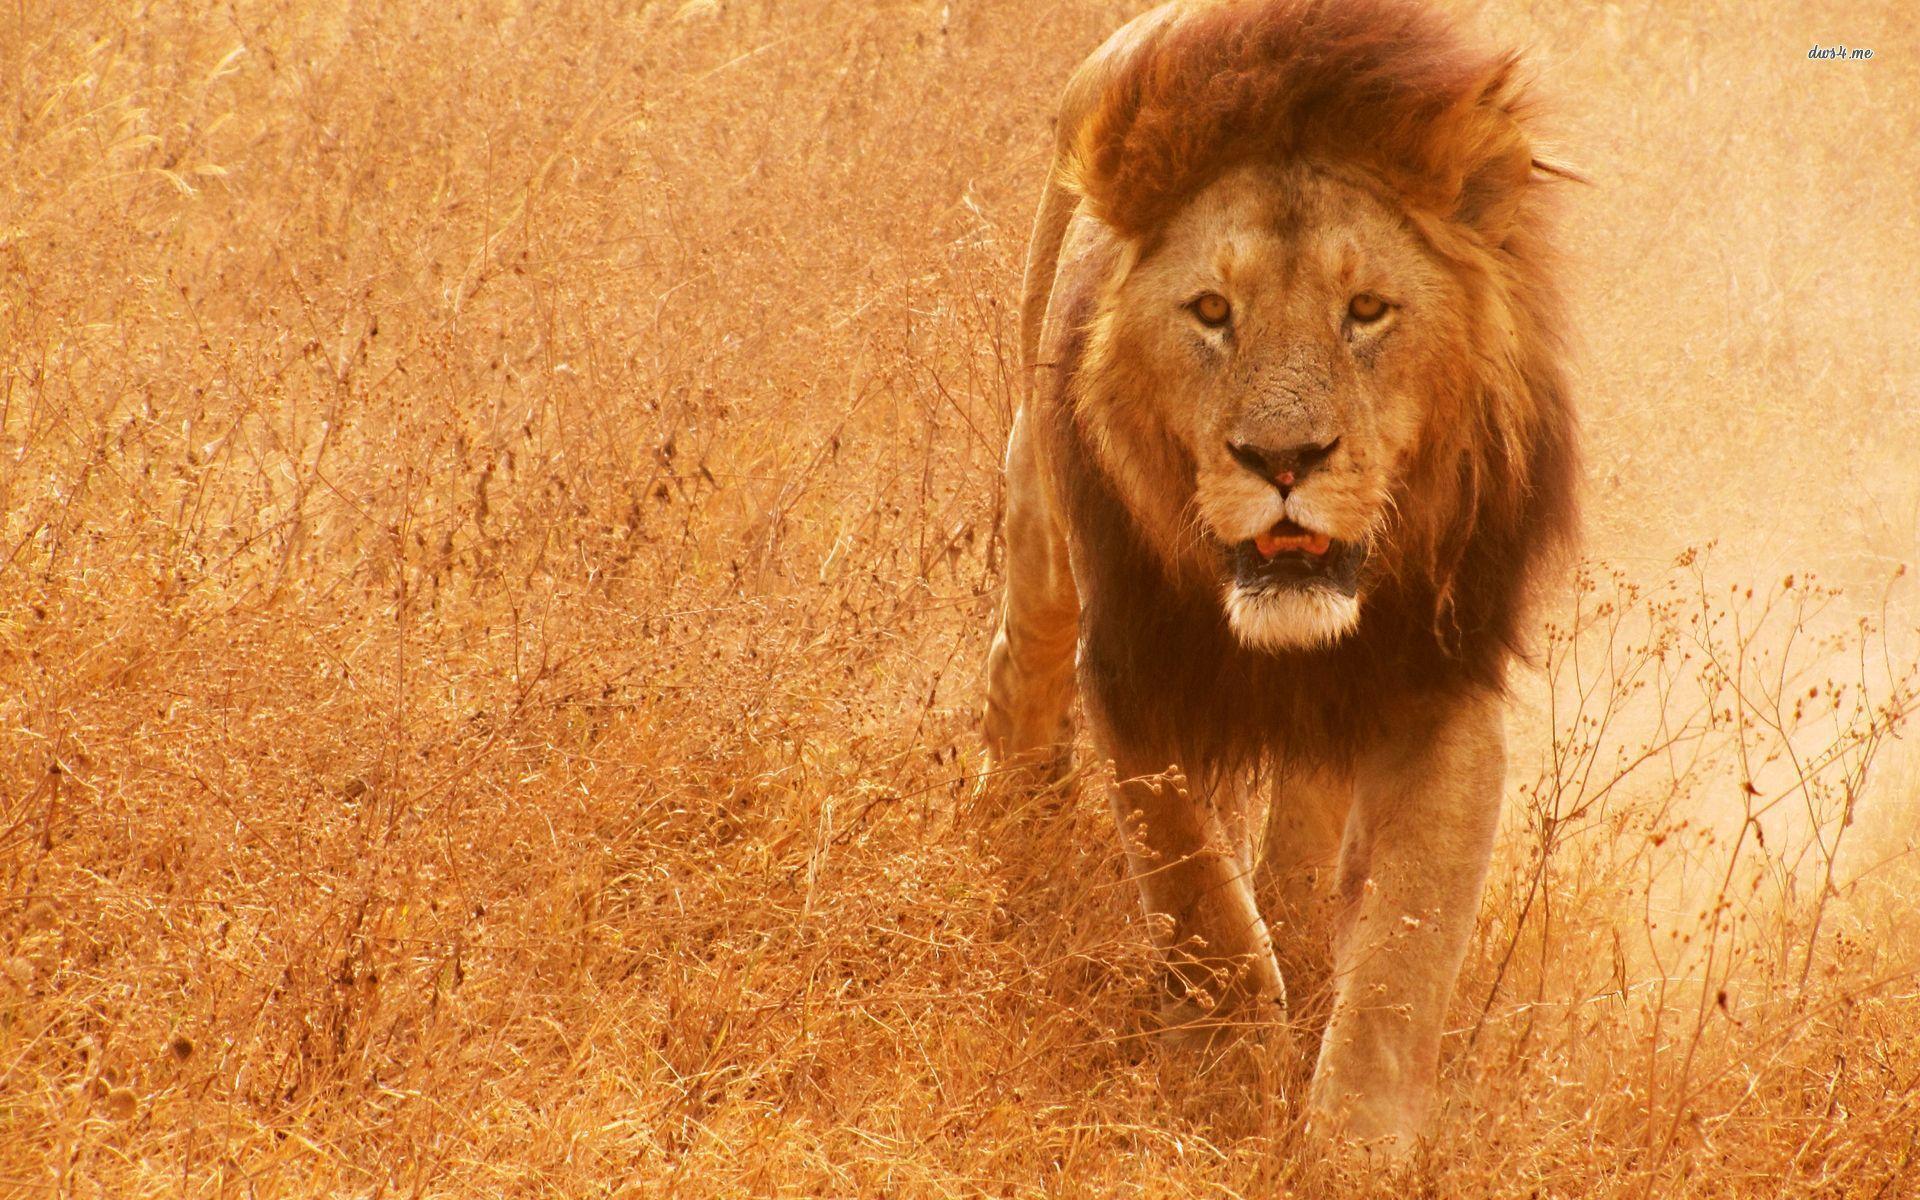 Lion Hd Wallpaper Wild